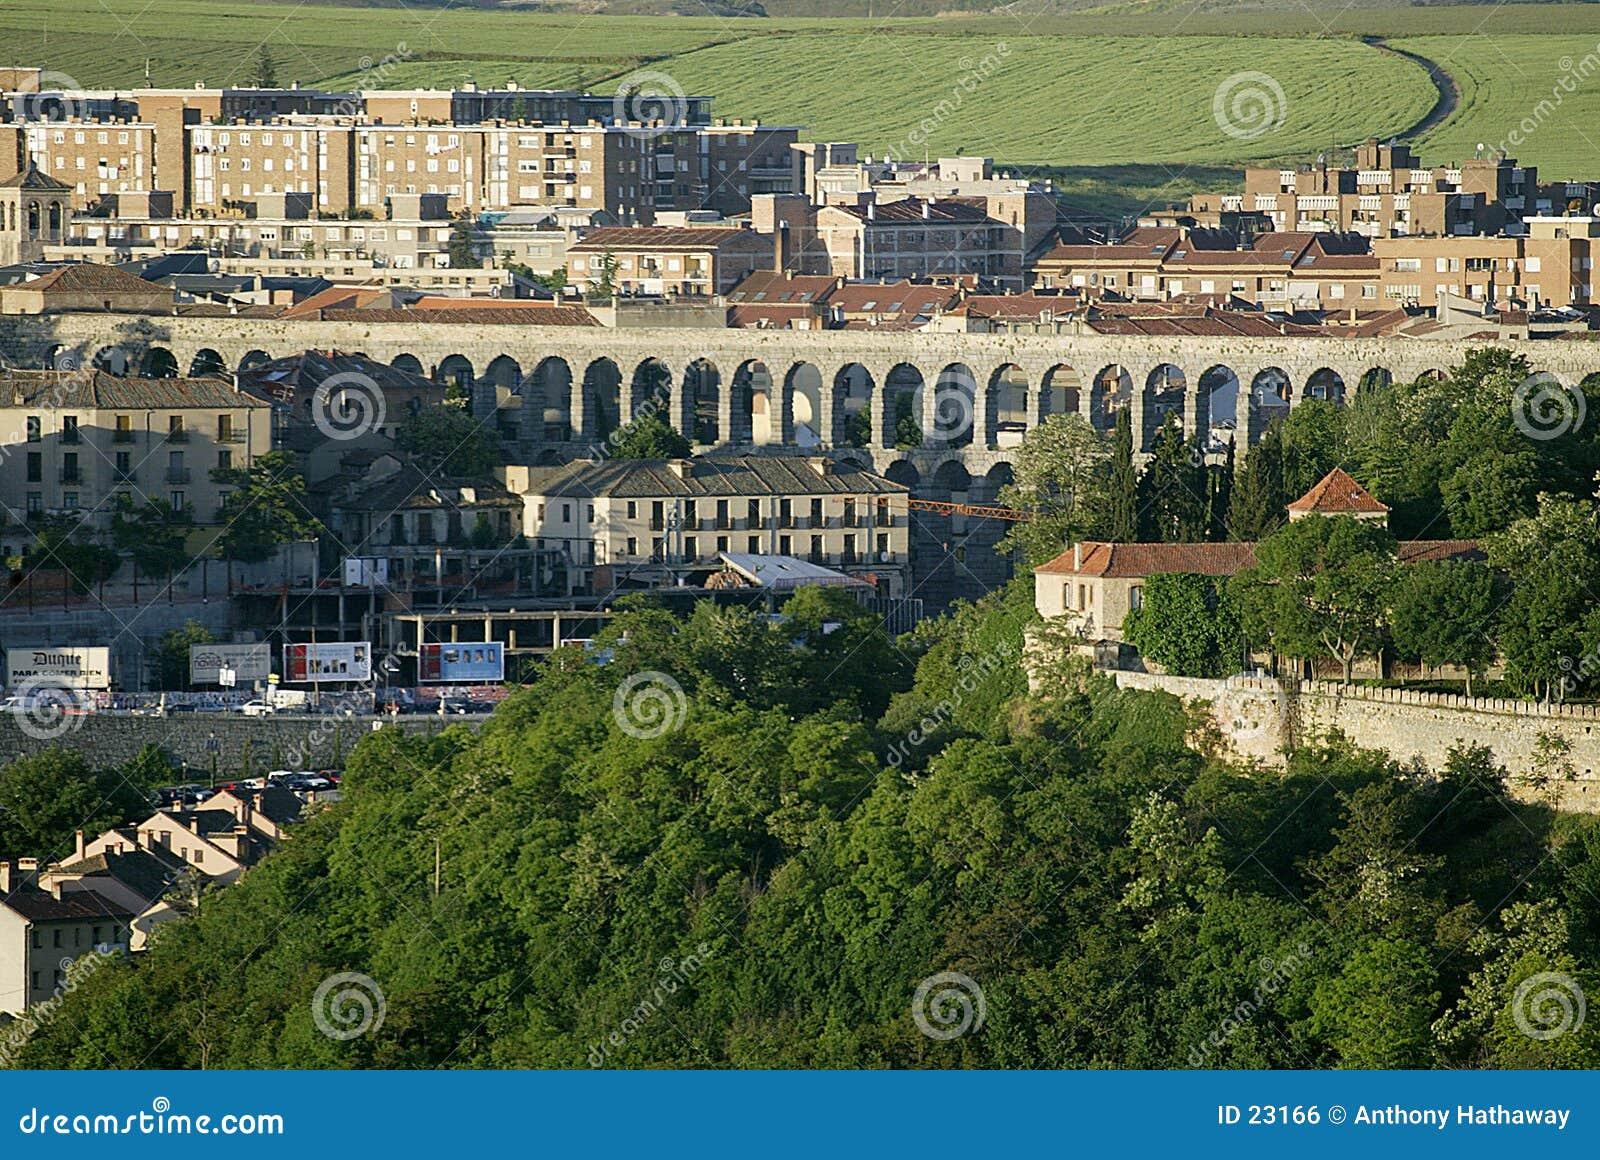 Aqueduct at Segovia, Spain